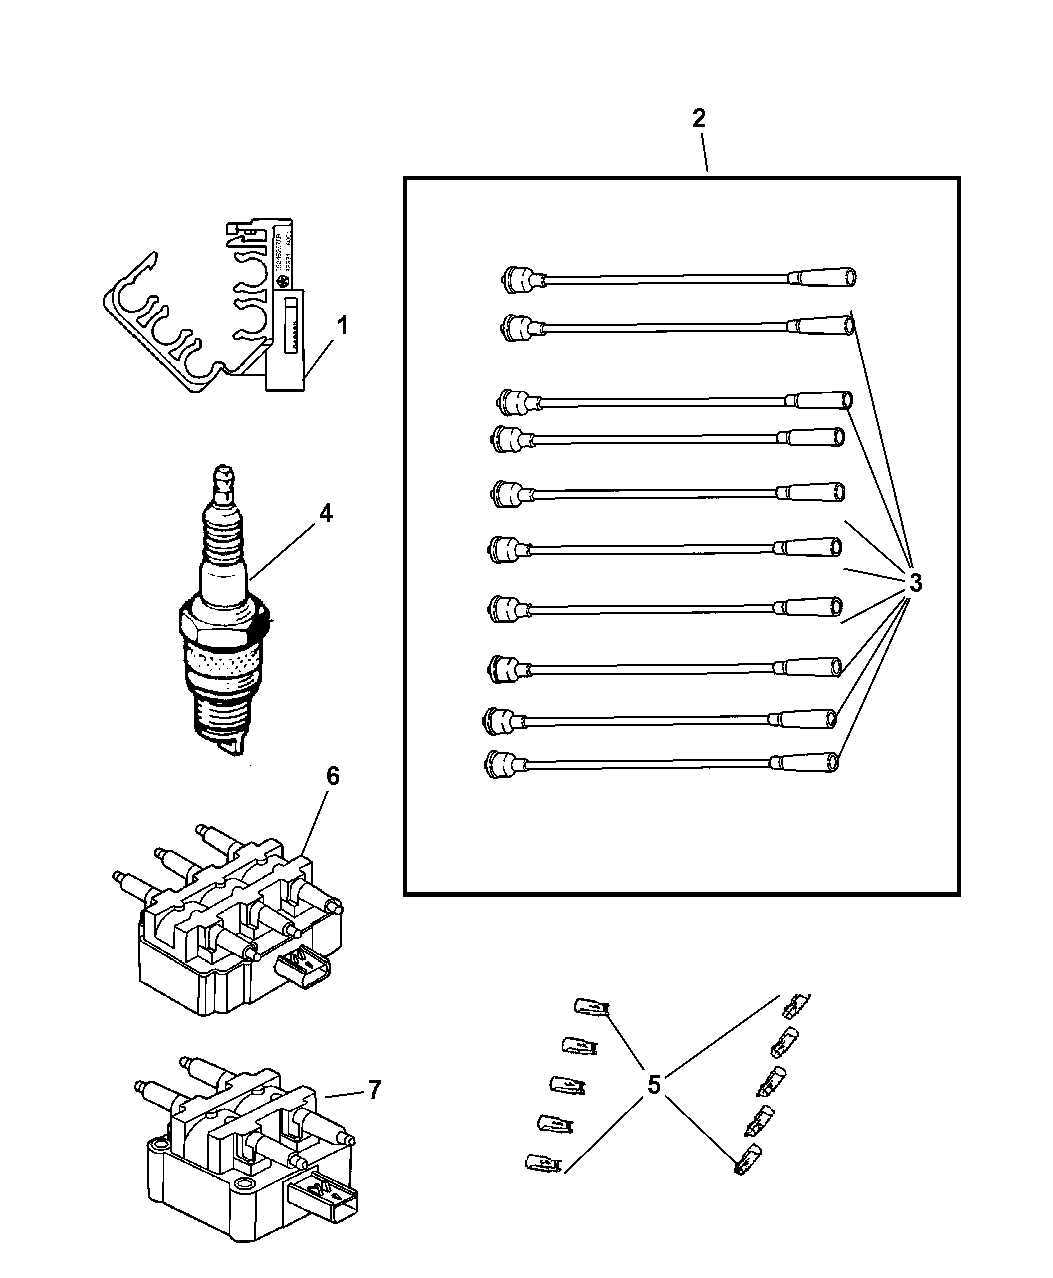 [Repair Manual 2006 Dodge Viper Download Windshield Wiper